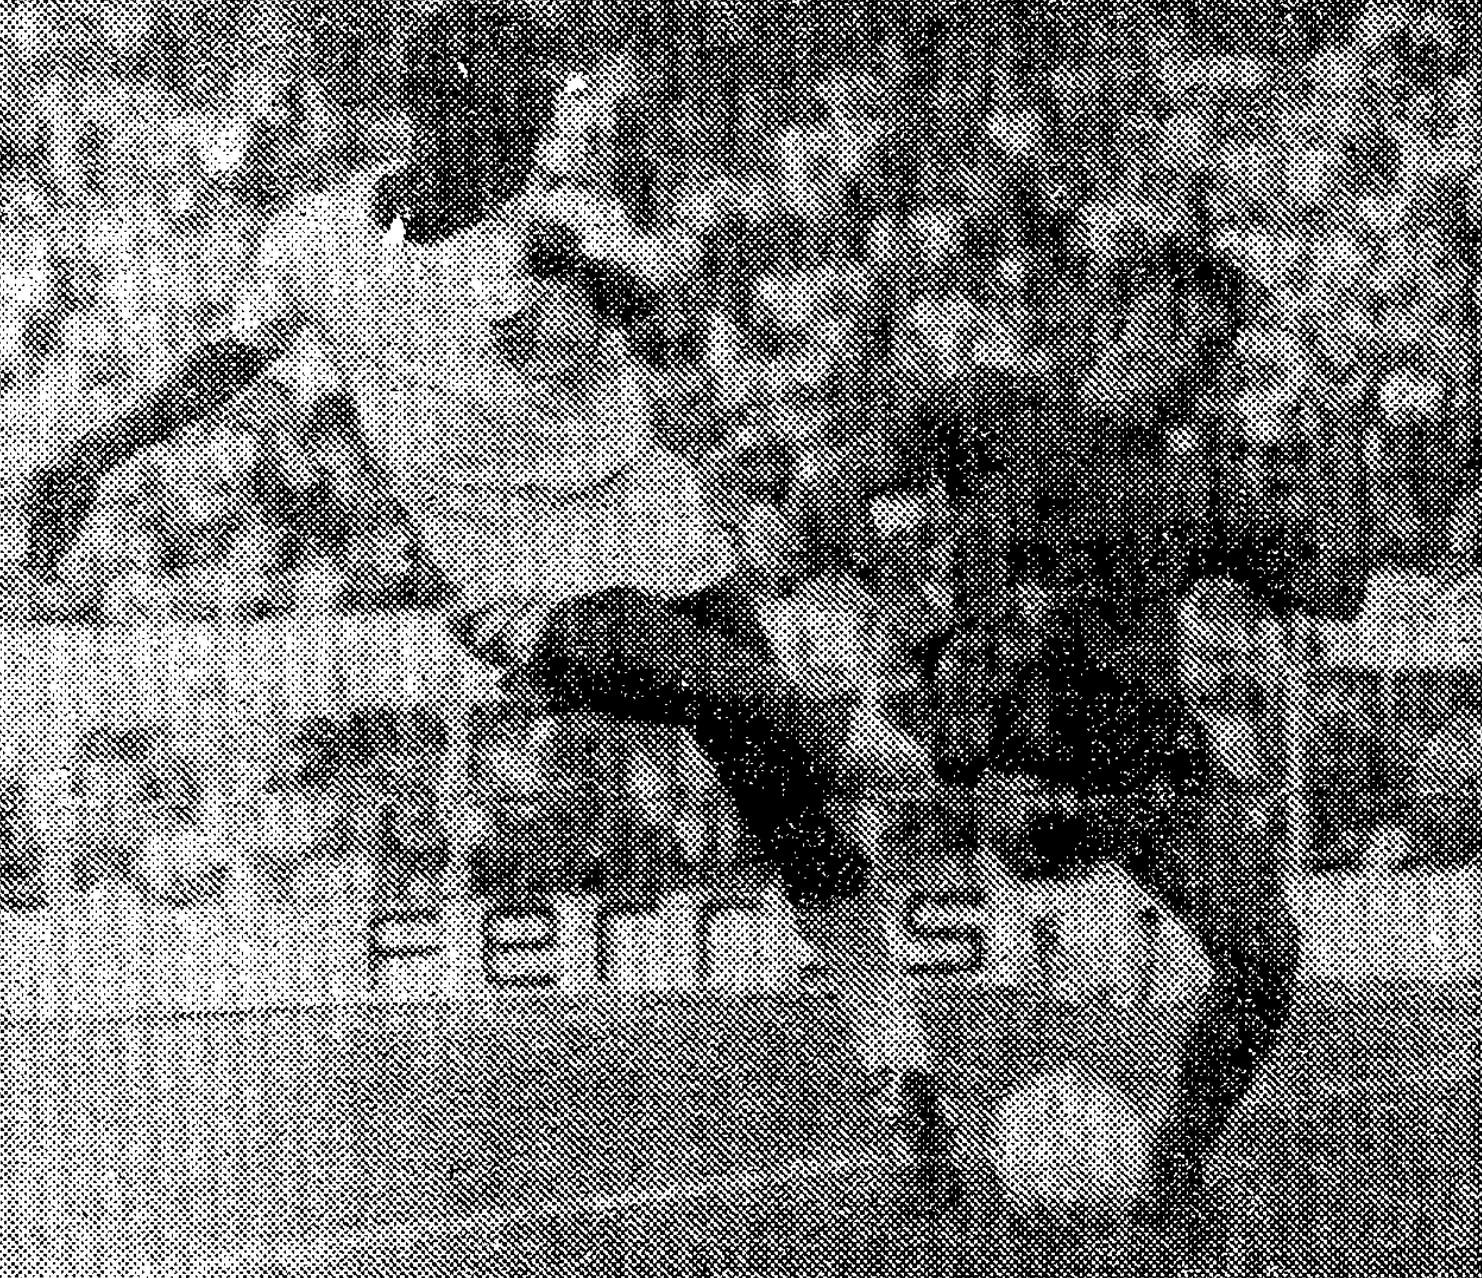 16.10.1977: Sevilla FC 1 - 0 Valencia CF